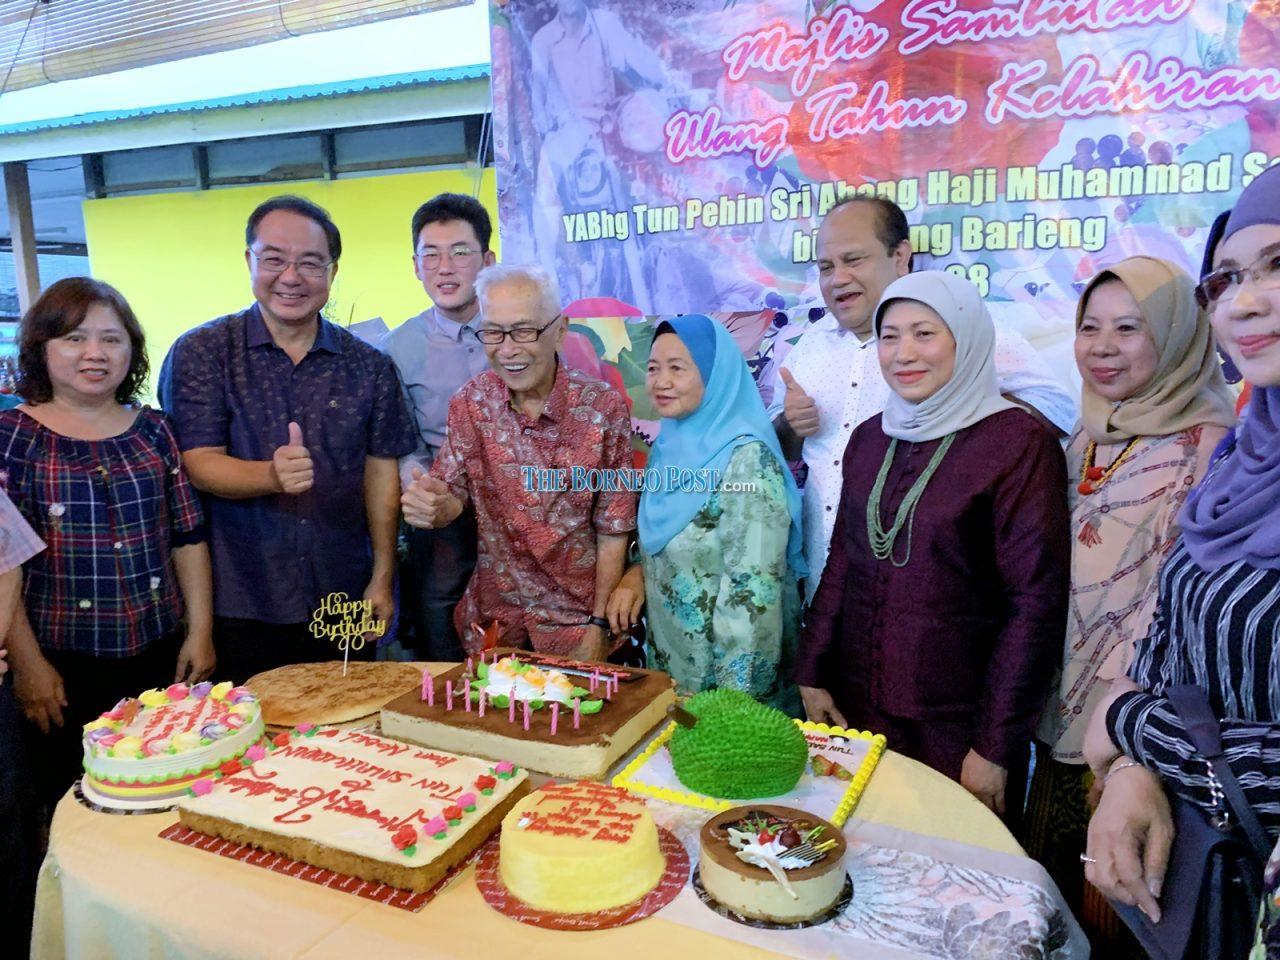 Happy 98th Birthday, Abang Salahuddin!